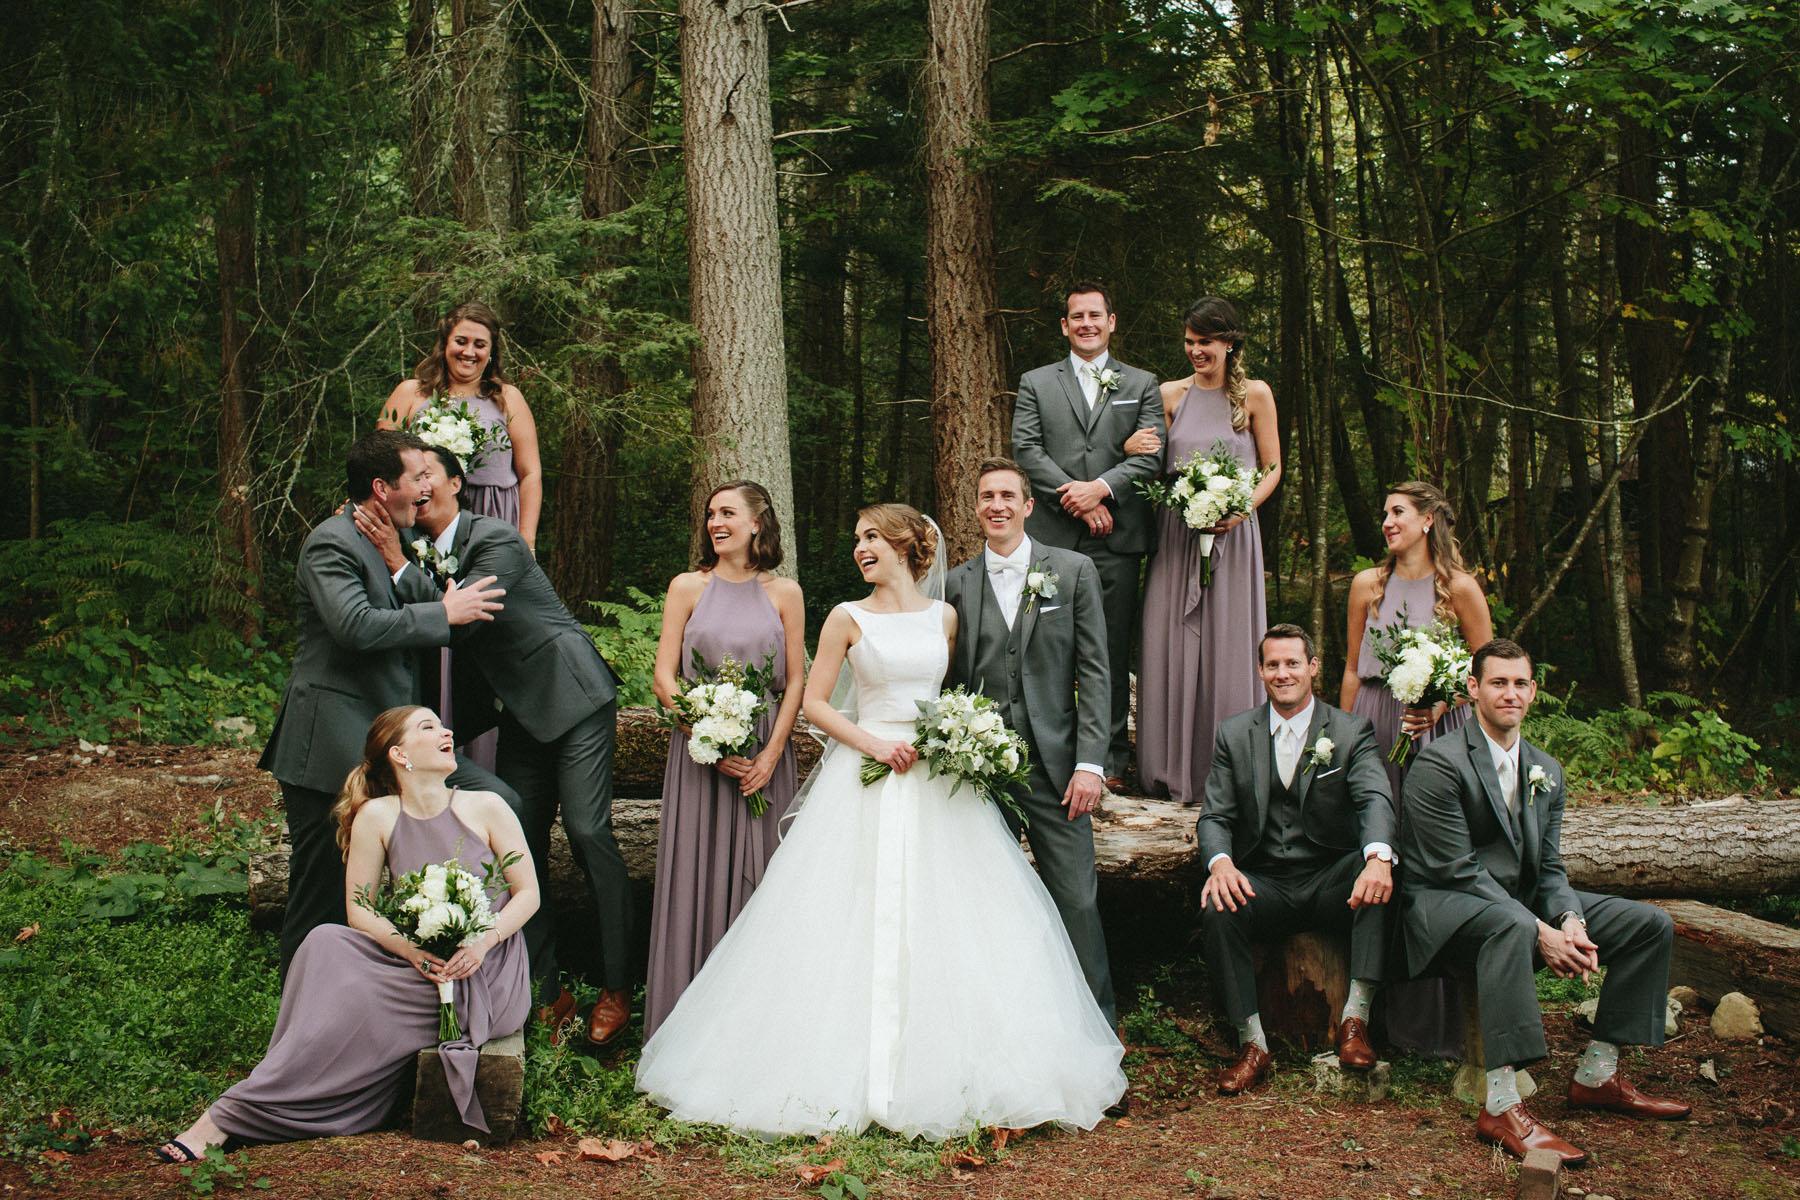 thetis-island-wedding-photographer-rp-rn-106.jpg